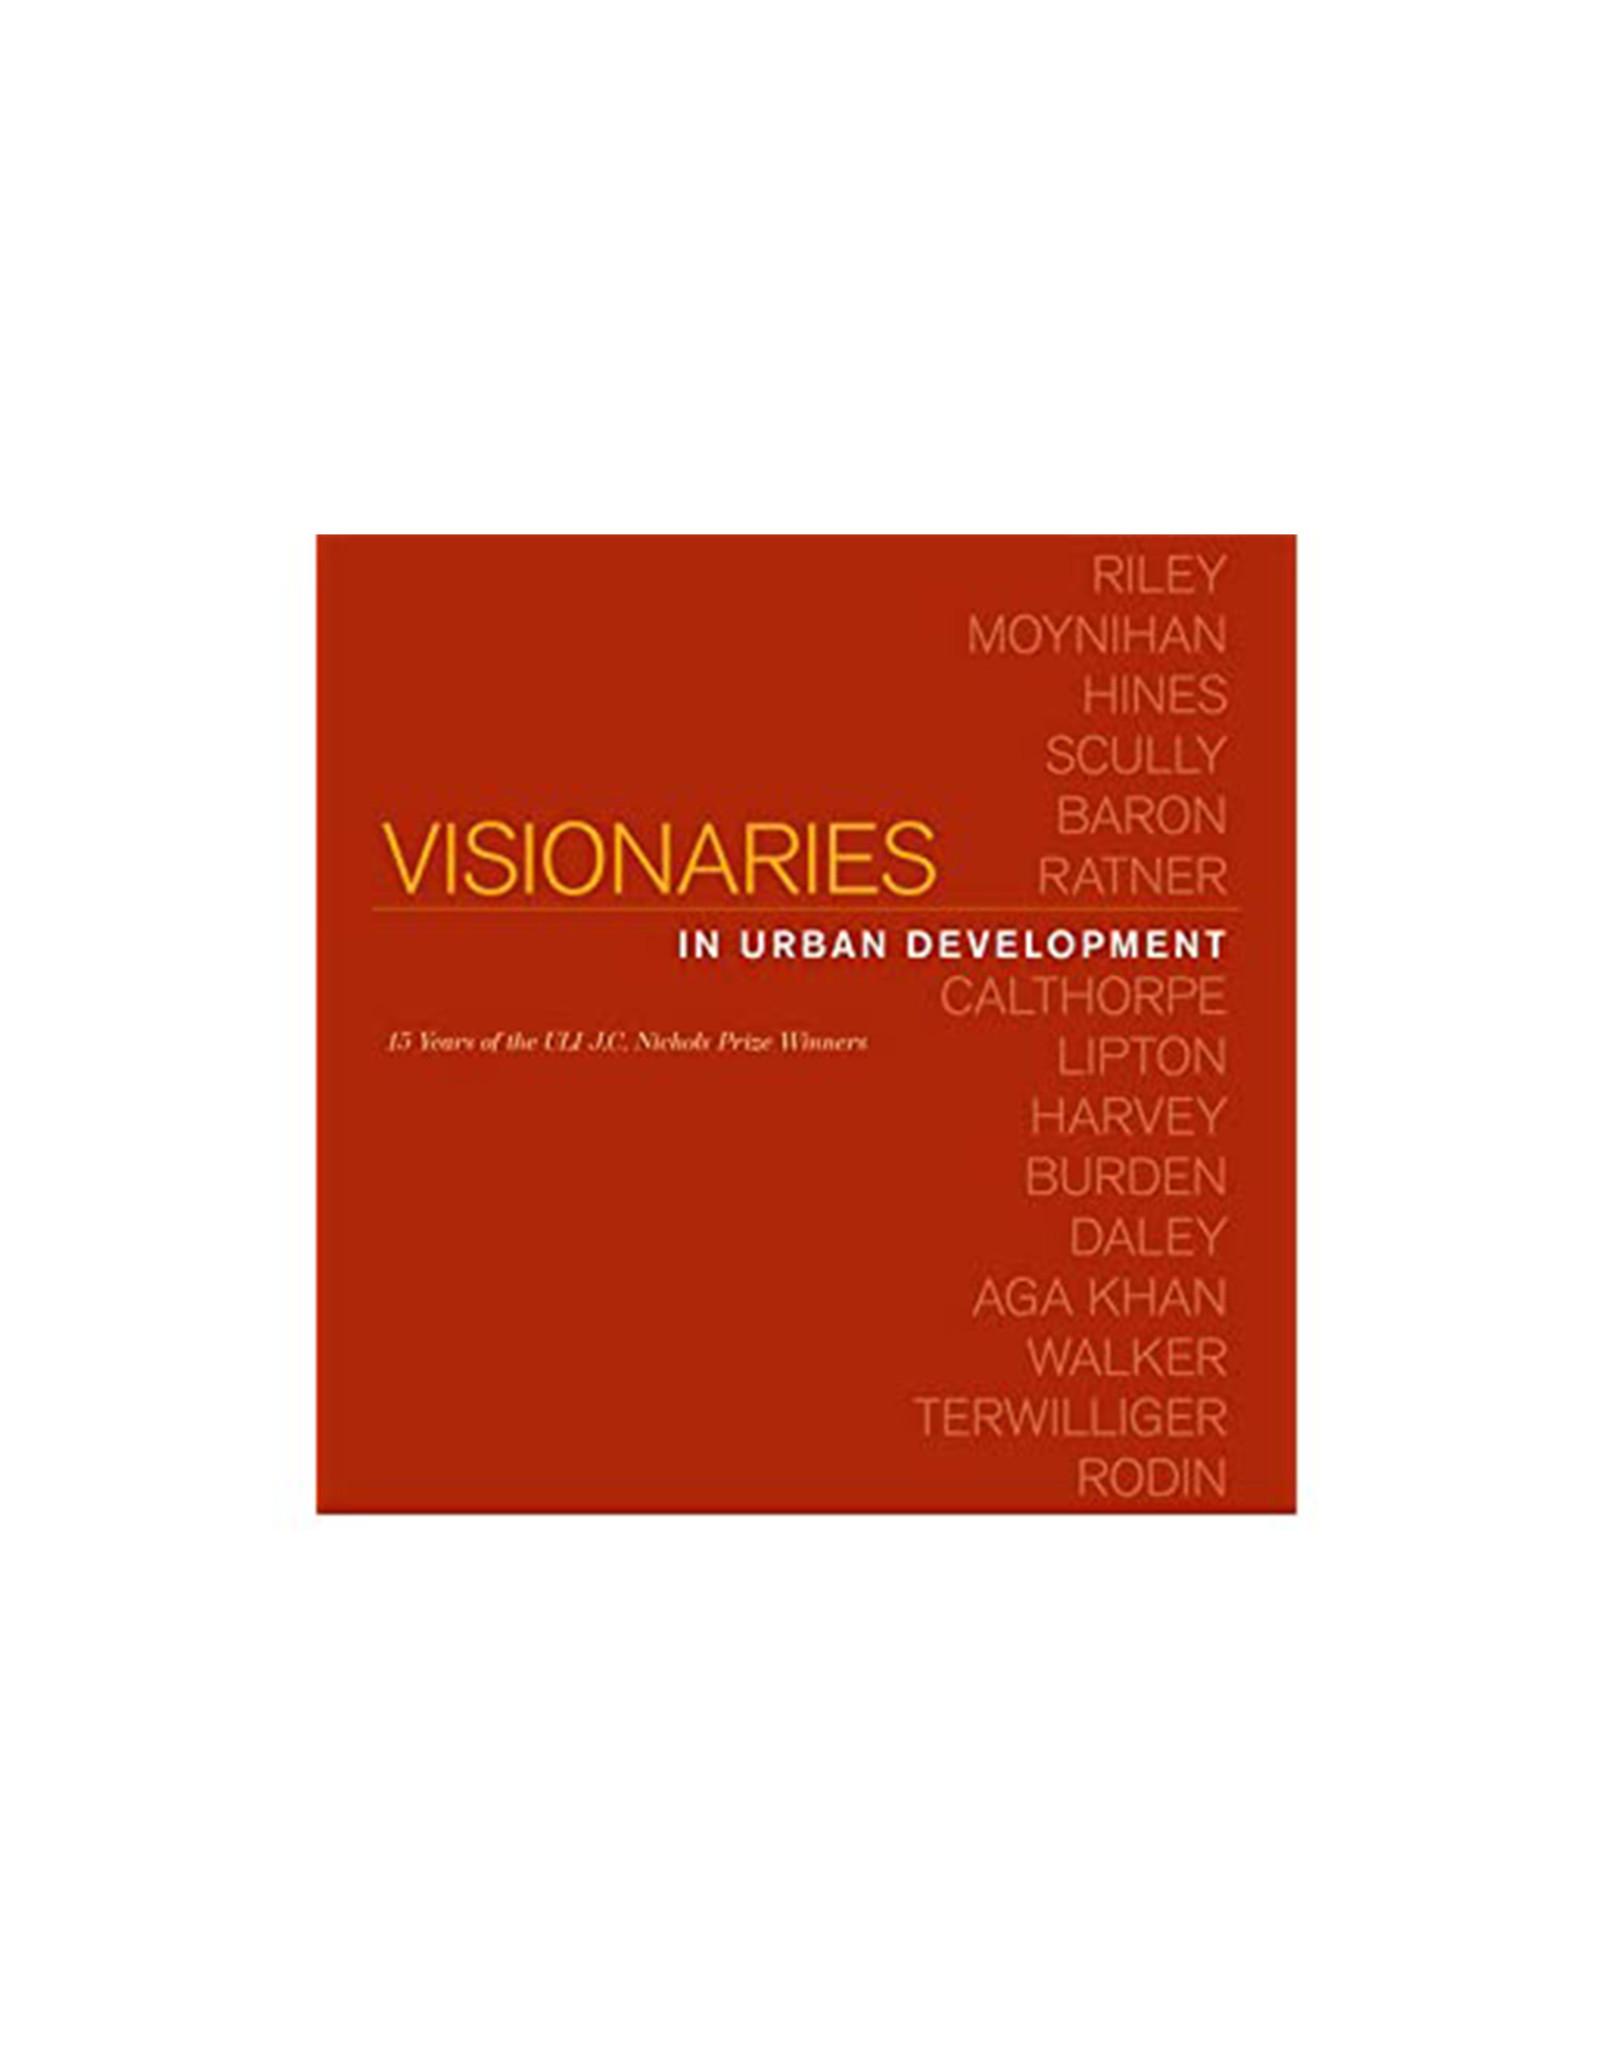 Visionaries in Urban Development